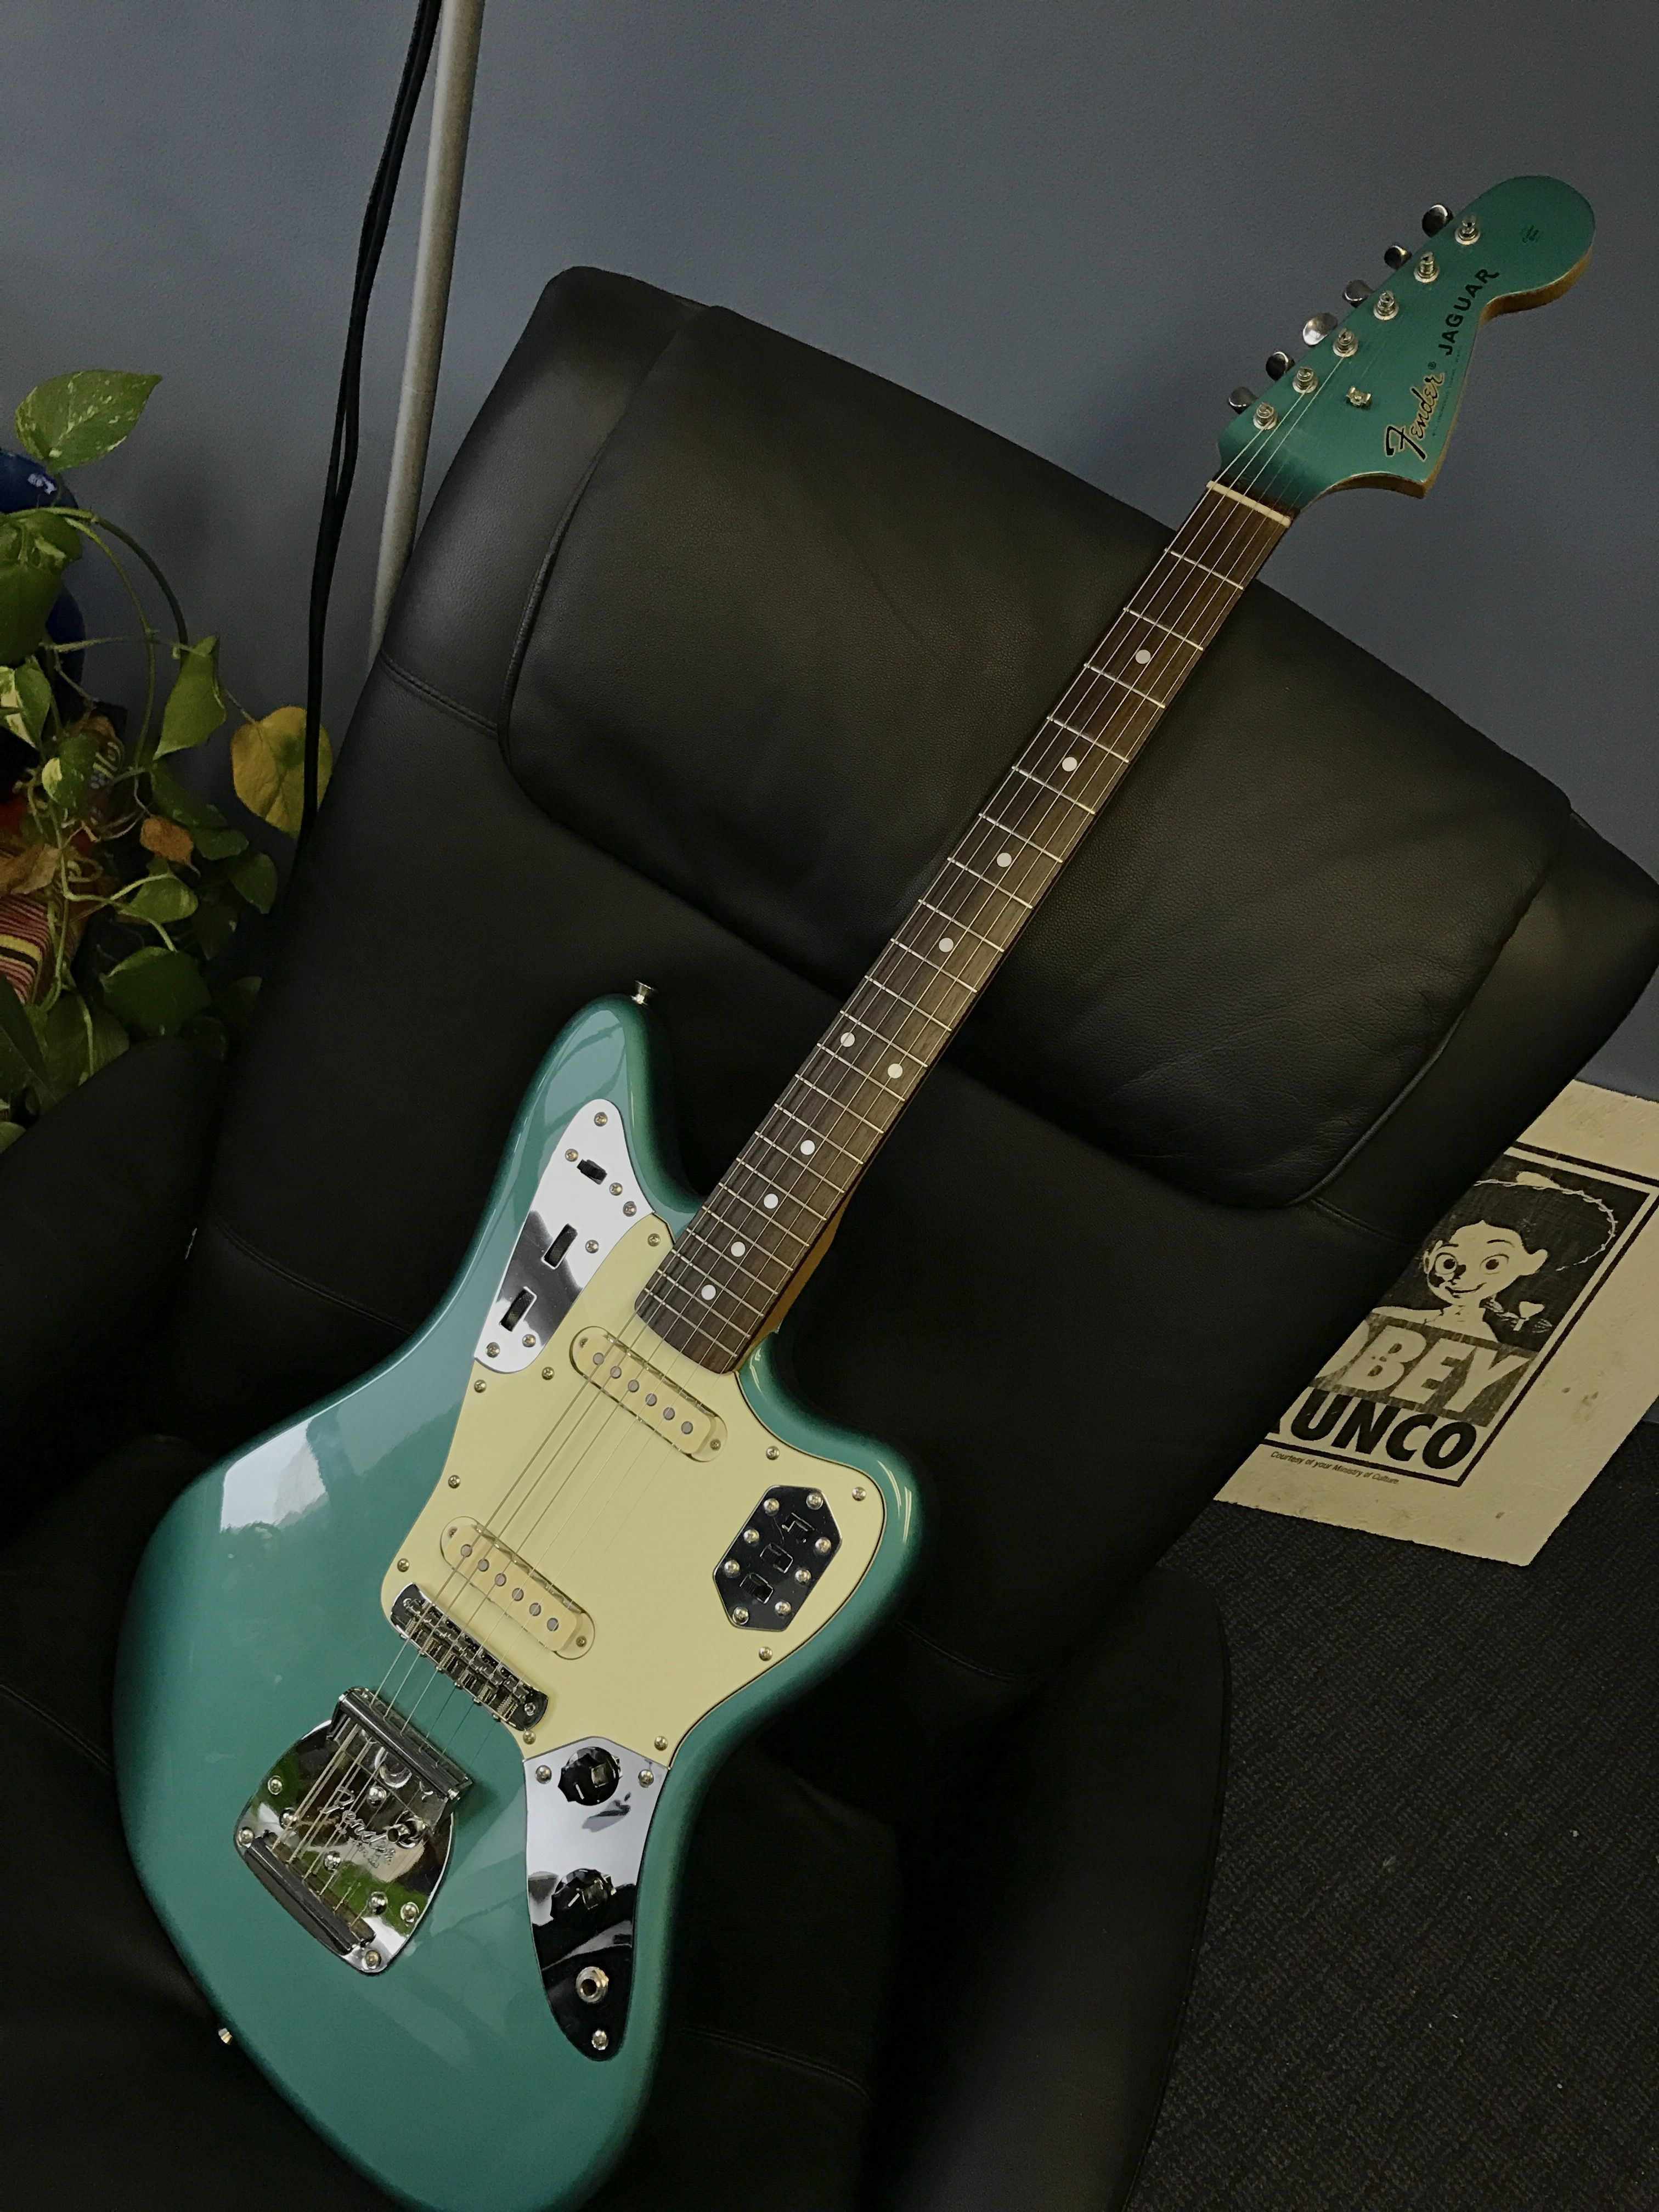 Cij Ocean Turquoise Metallic Fender Jaguar Fender Jaguar Jaguar Fender Guitars